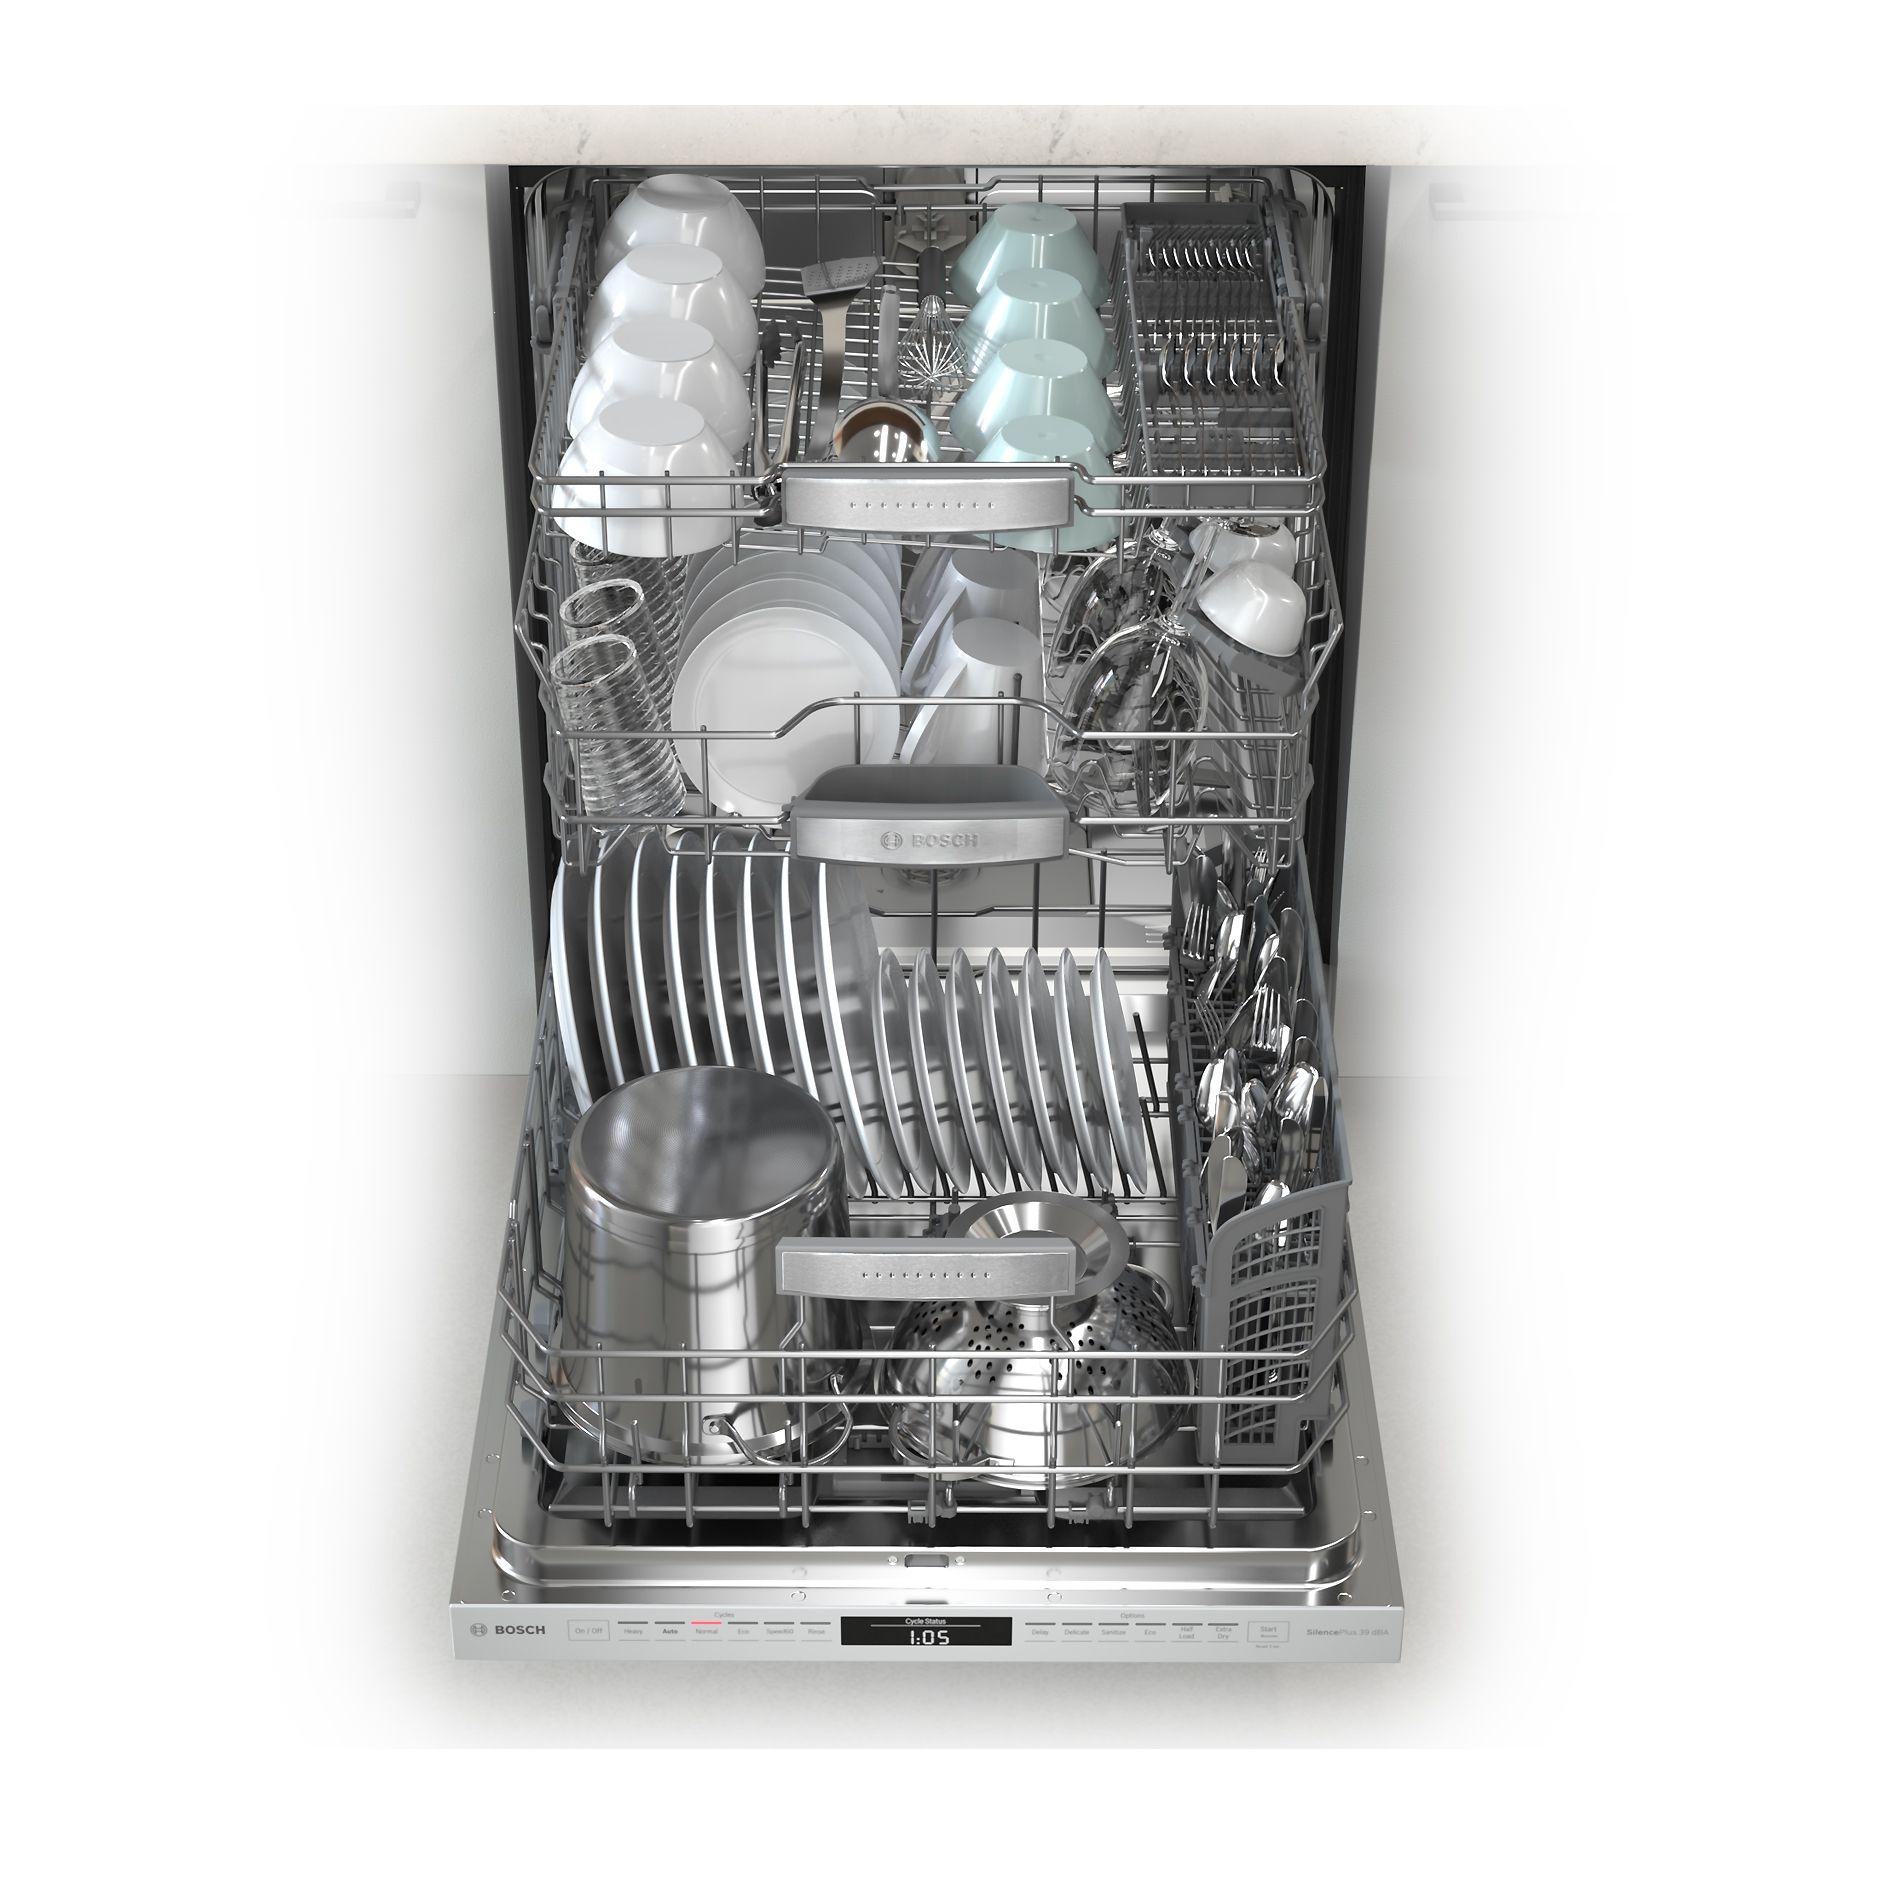 What Makes Bosch Premium Dishwashers Premium Boschappliances Boschdiswasher Bestbuy Appliances V Cool Things To Buy Diy Detergent Diy Dishwasher Detergent